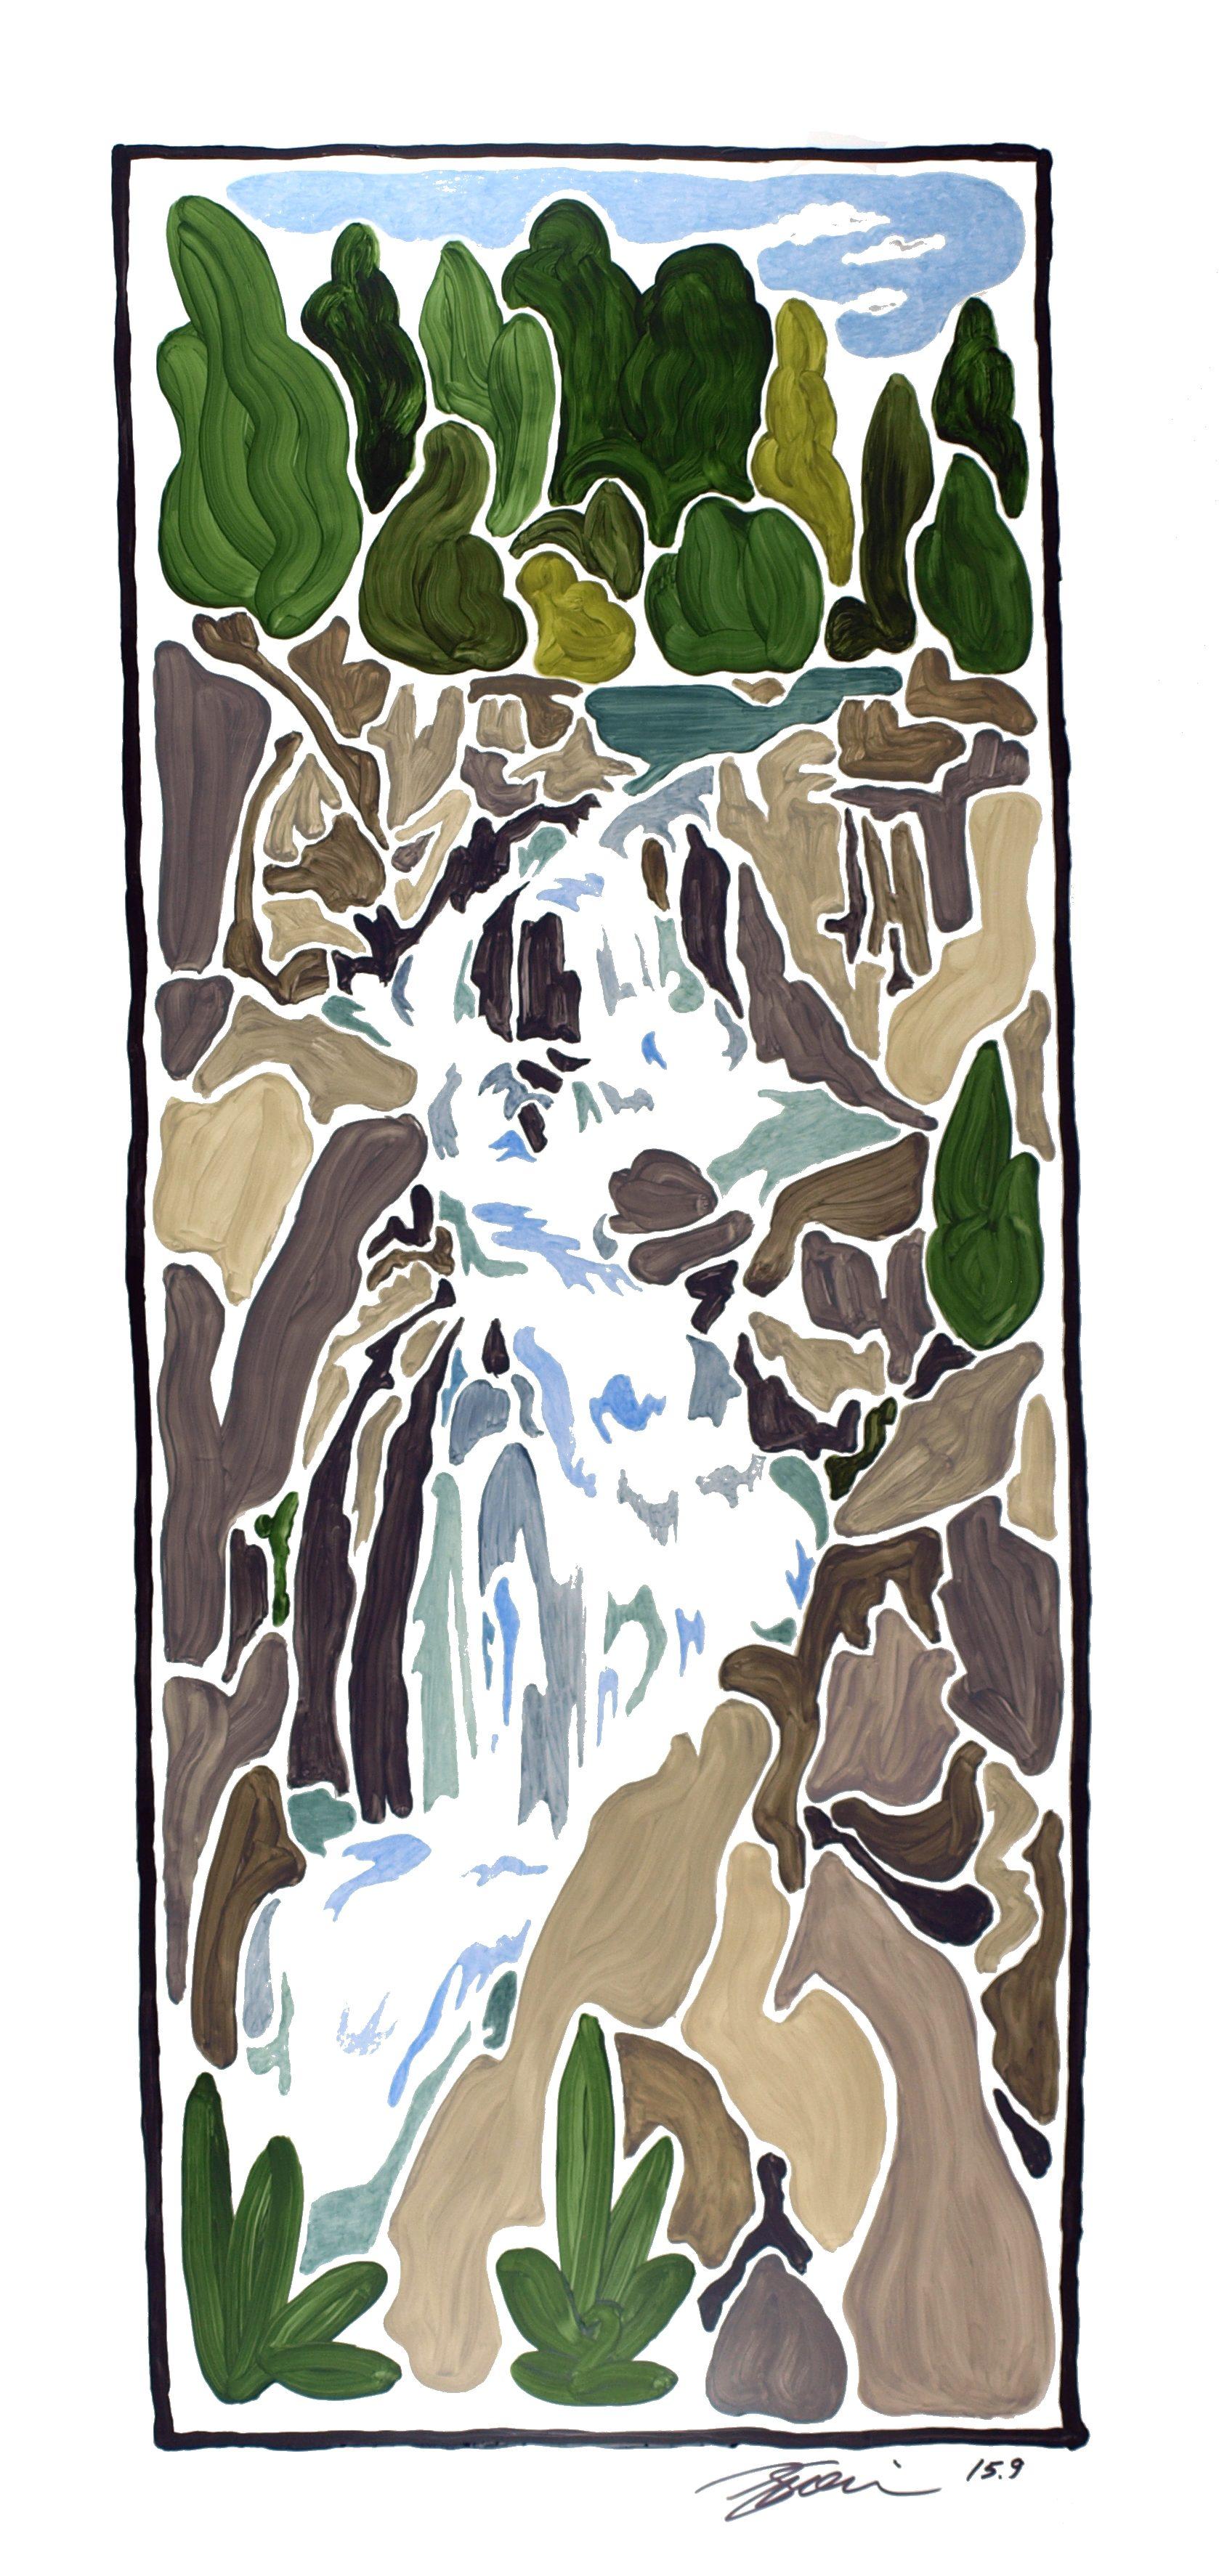 Rudy Guernica - Cabin John Tributary II